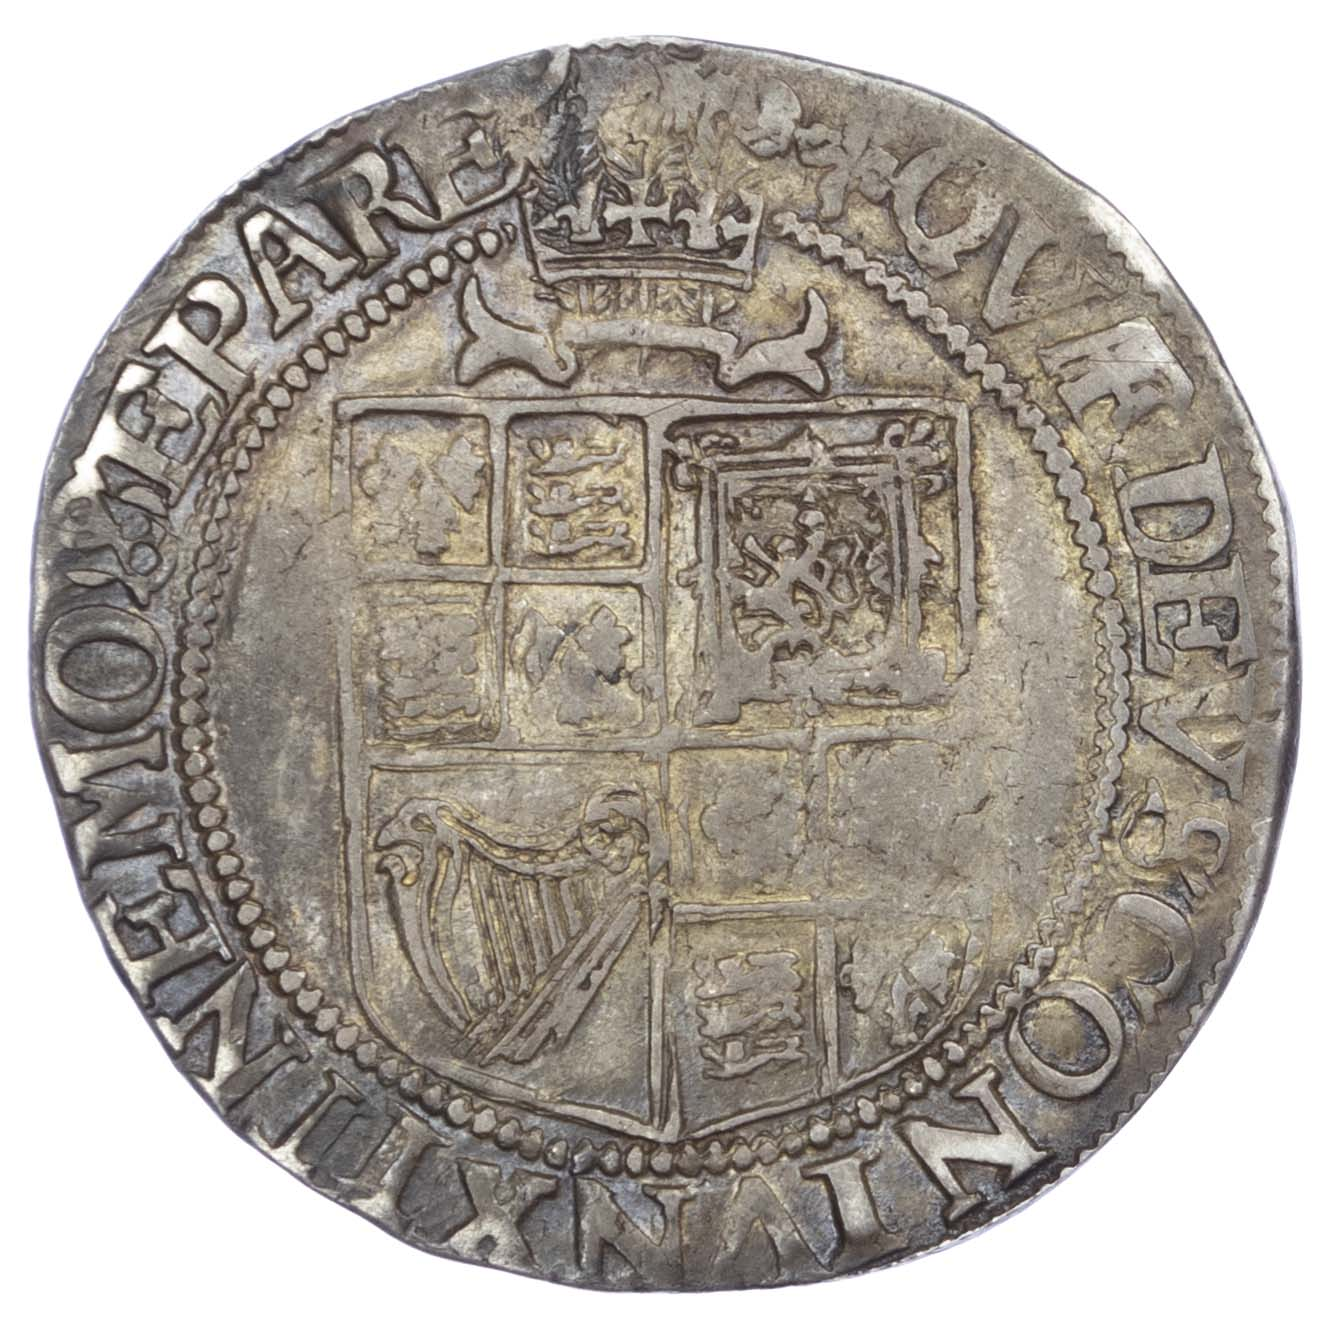 James I (1603-25), Shilling, third coinage, mintmark trefoil